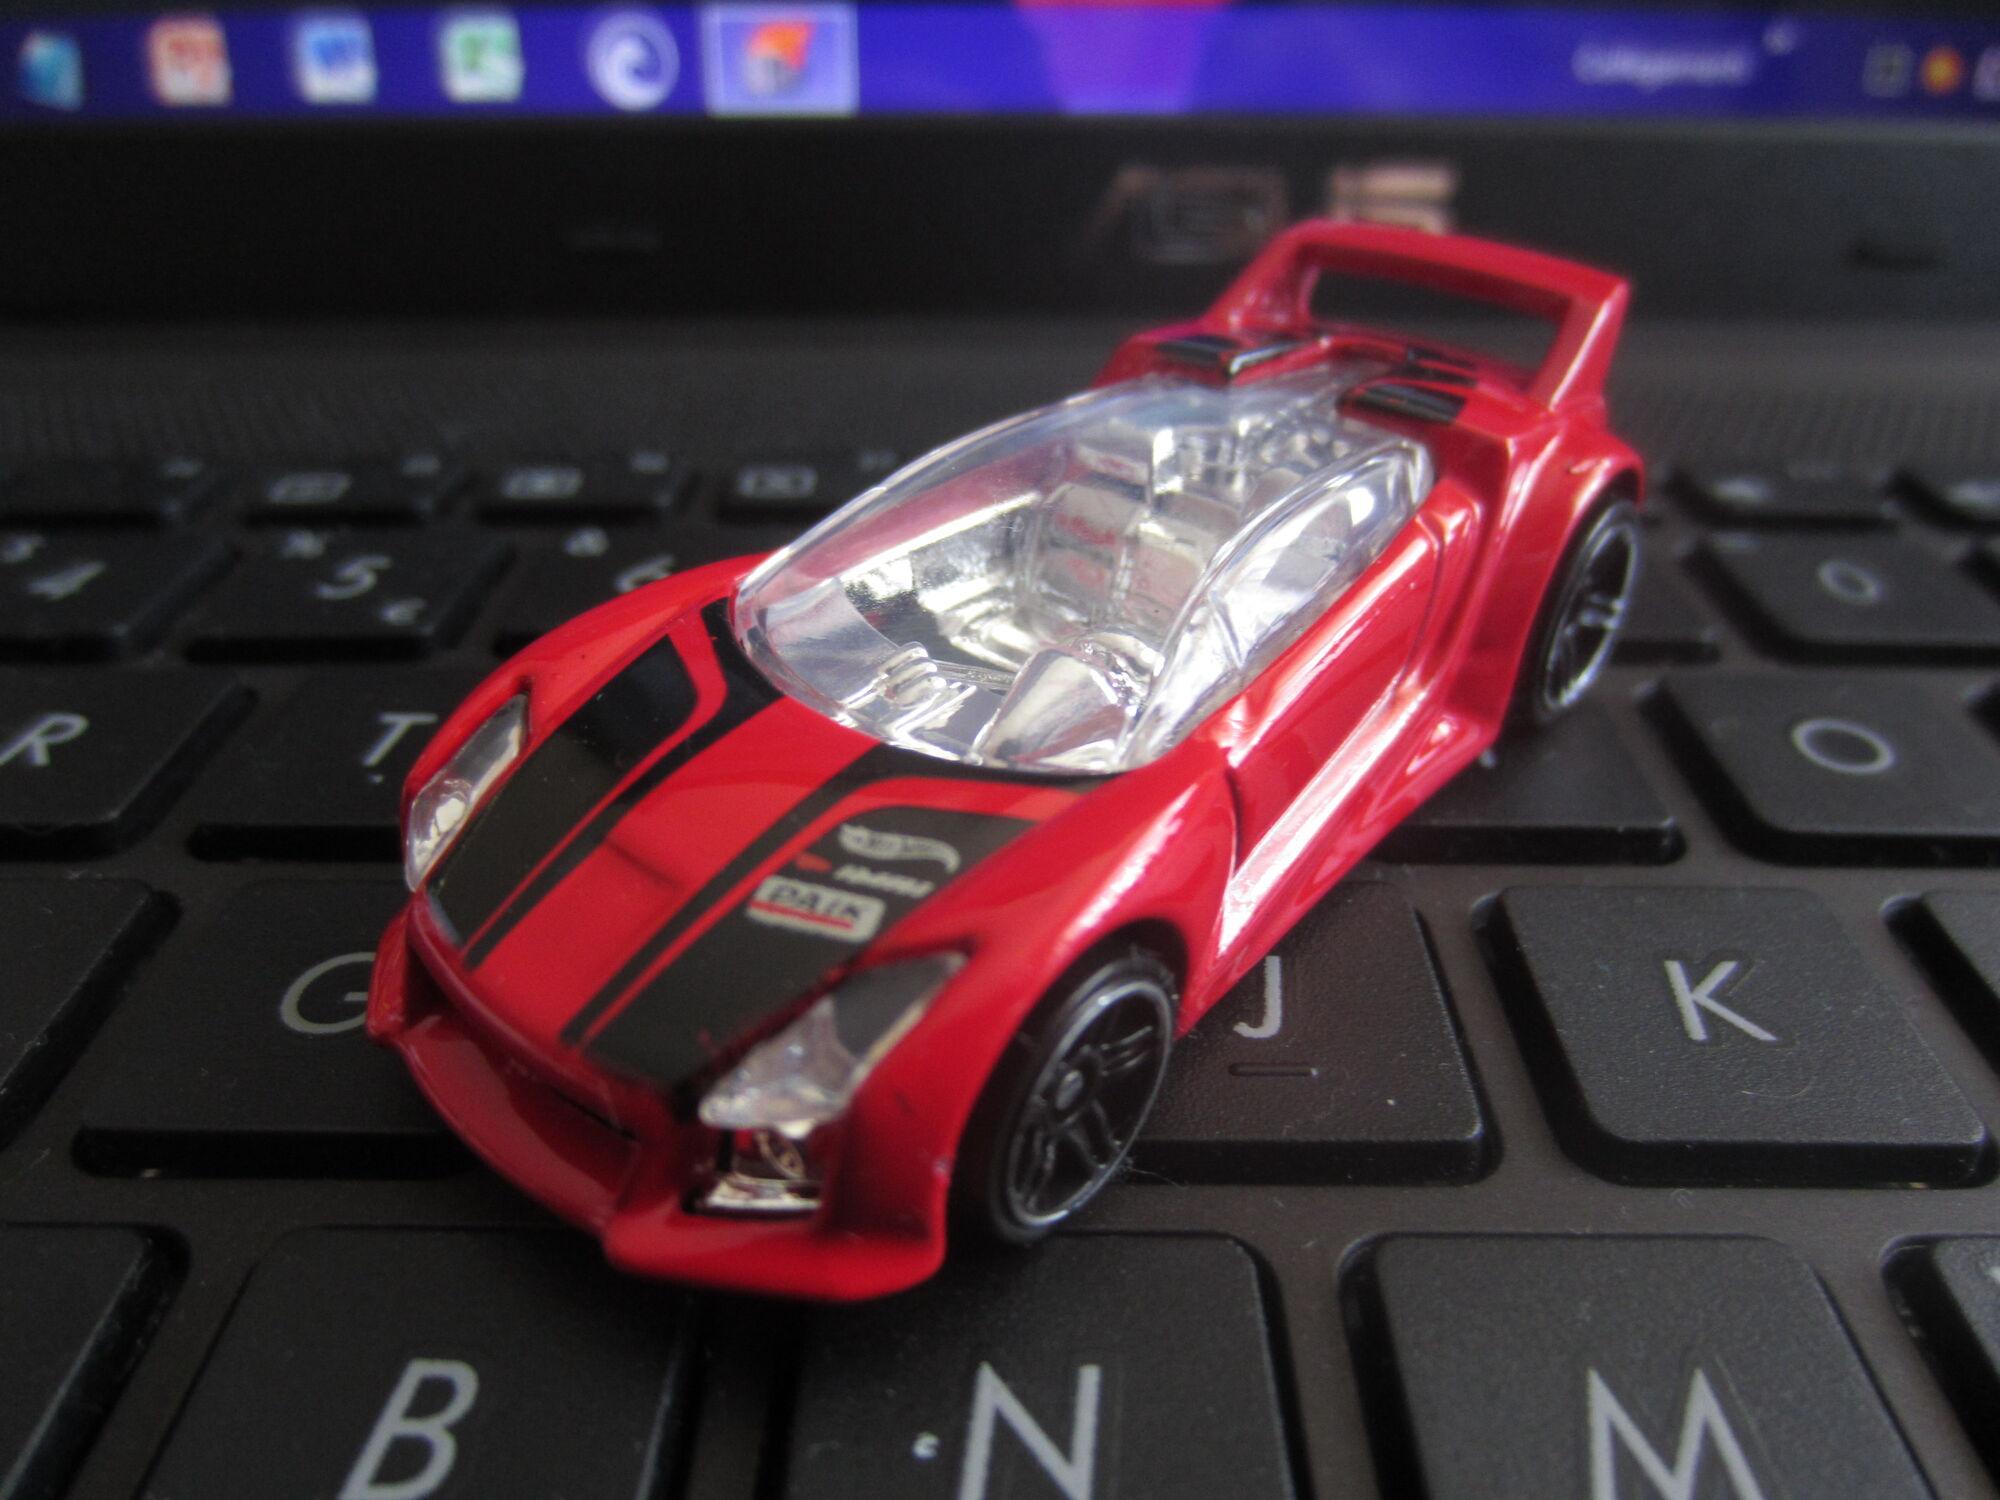 2000?cb=20130601122101 Surprising Lamborghini Gallardo Hot Wheels Wiki Cars Trend